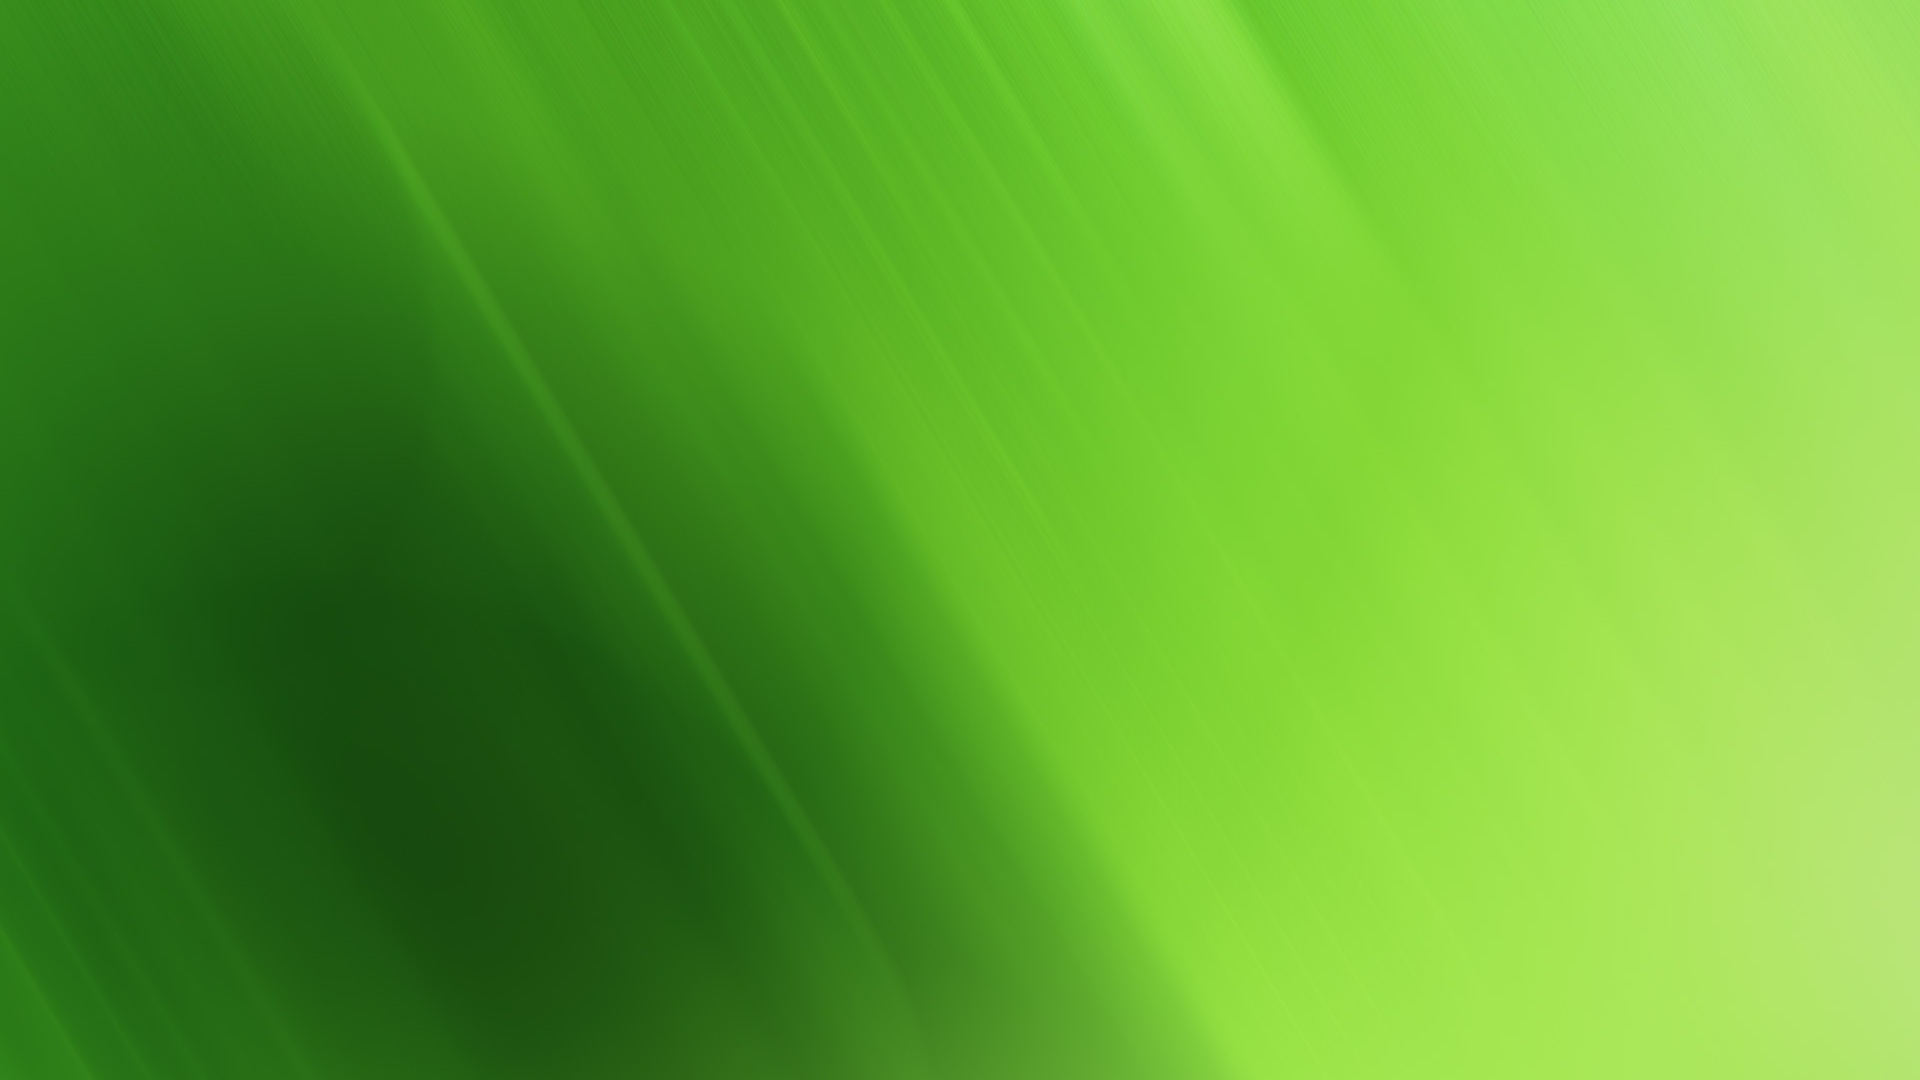 Green Background 003 Hd